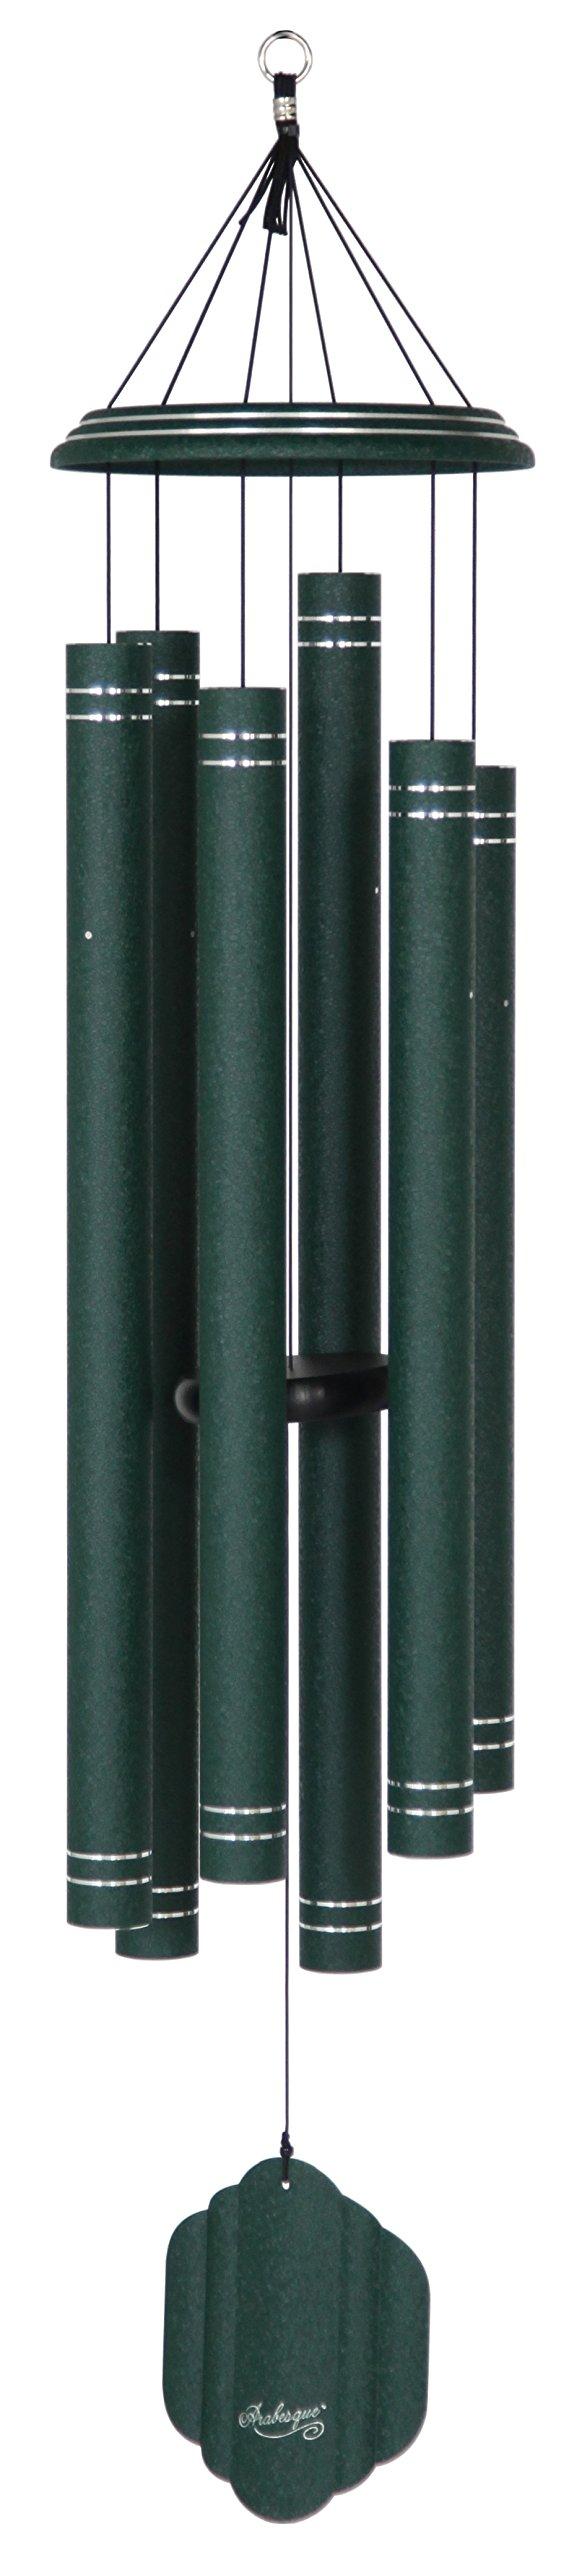 Arabesque 59-inch Windchime, Emerald